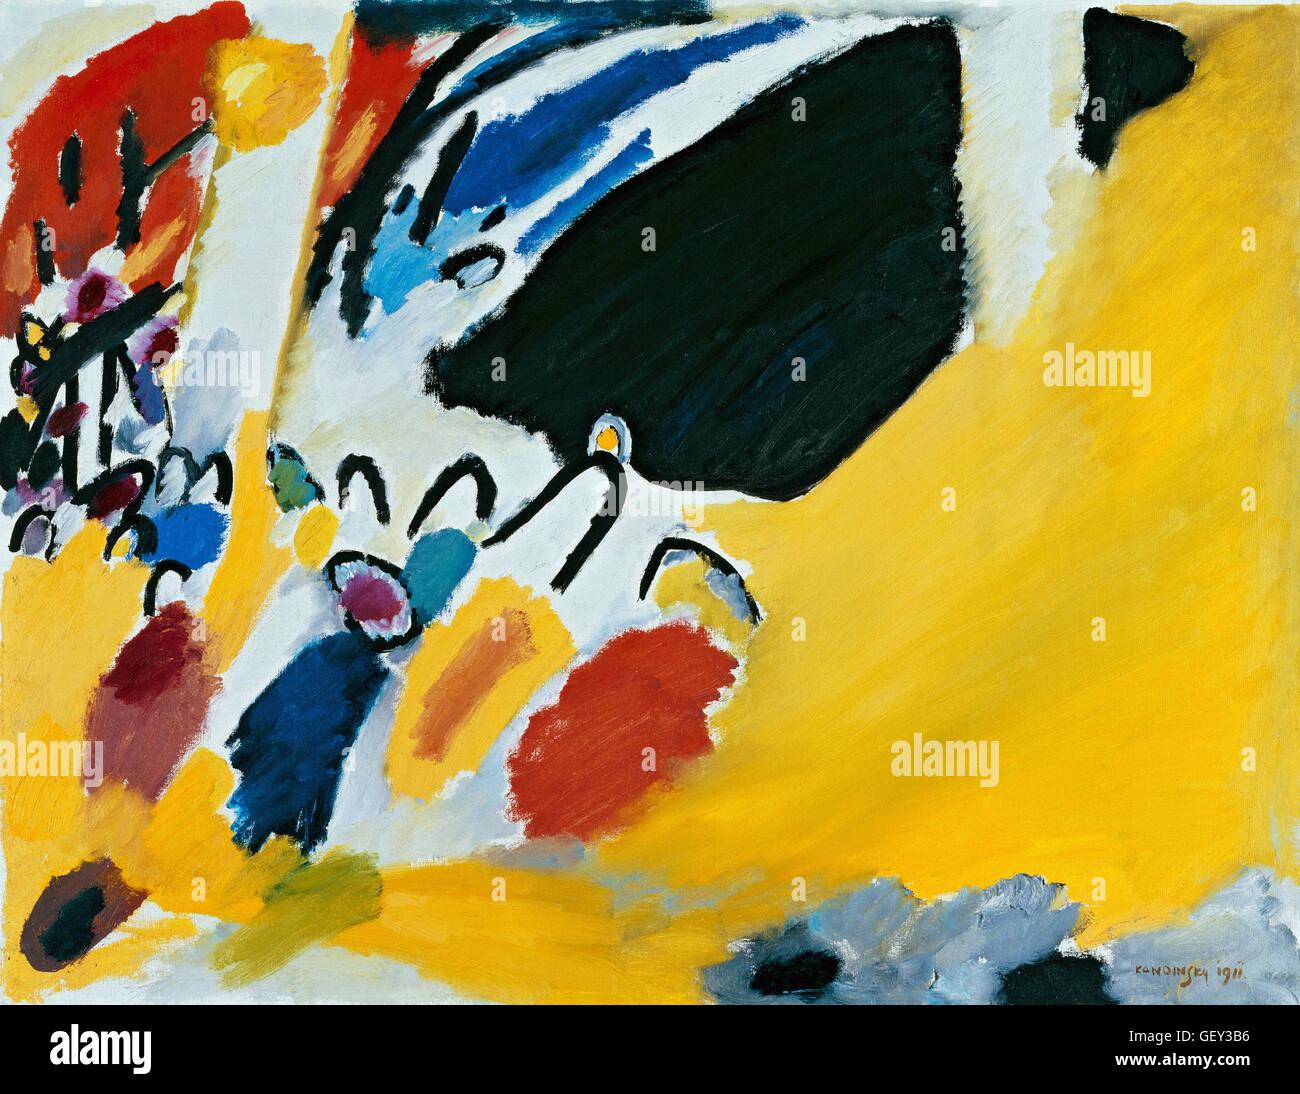 Wassily Kandinsky - Impression III (Concert) - Stock Image